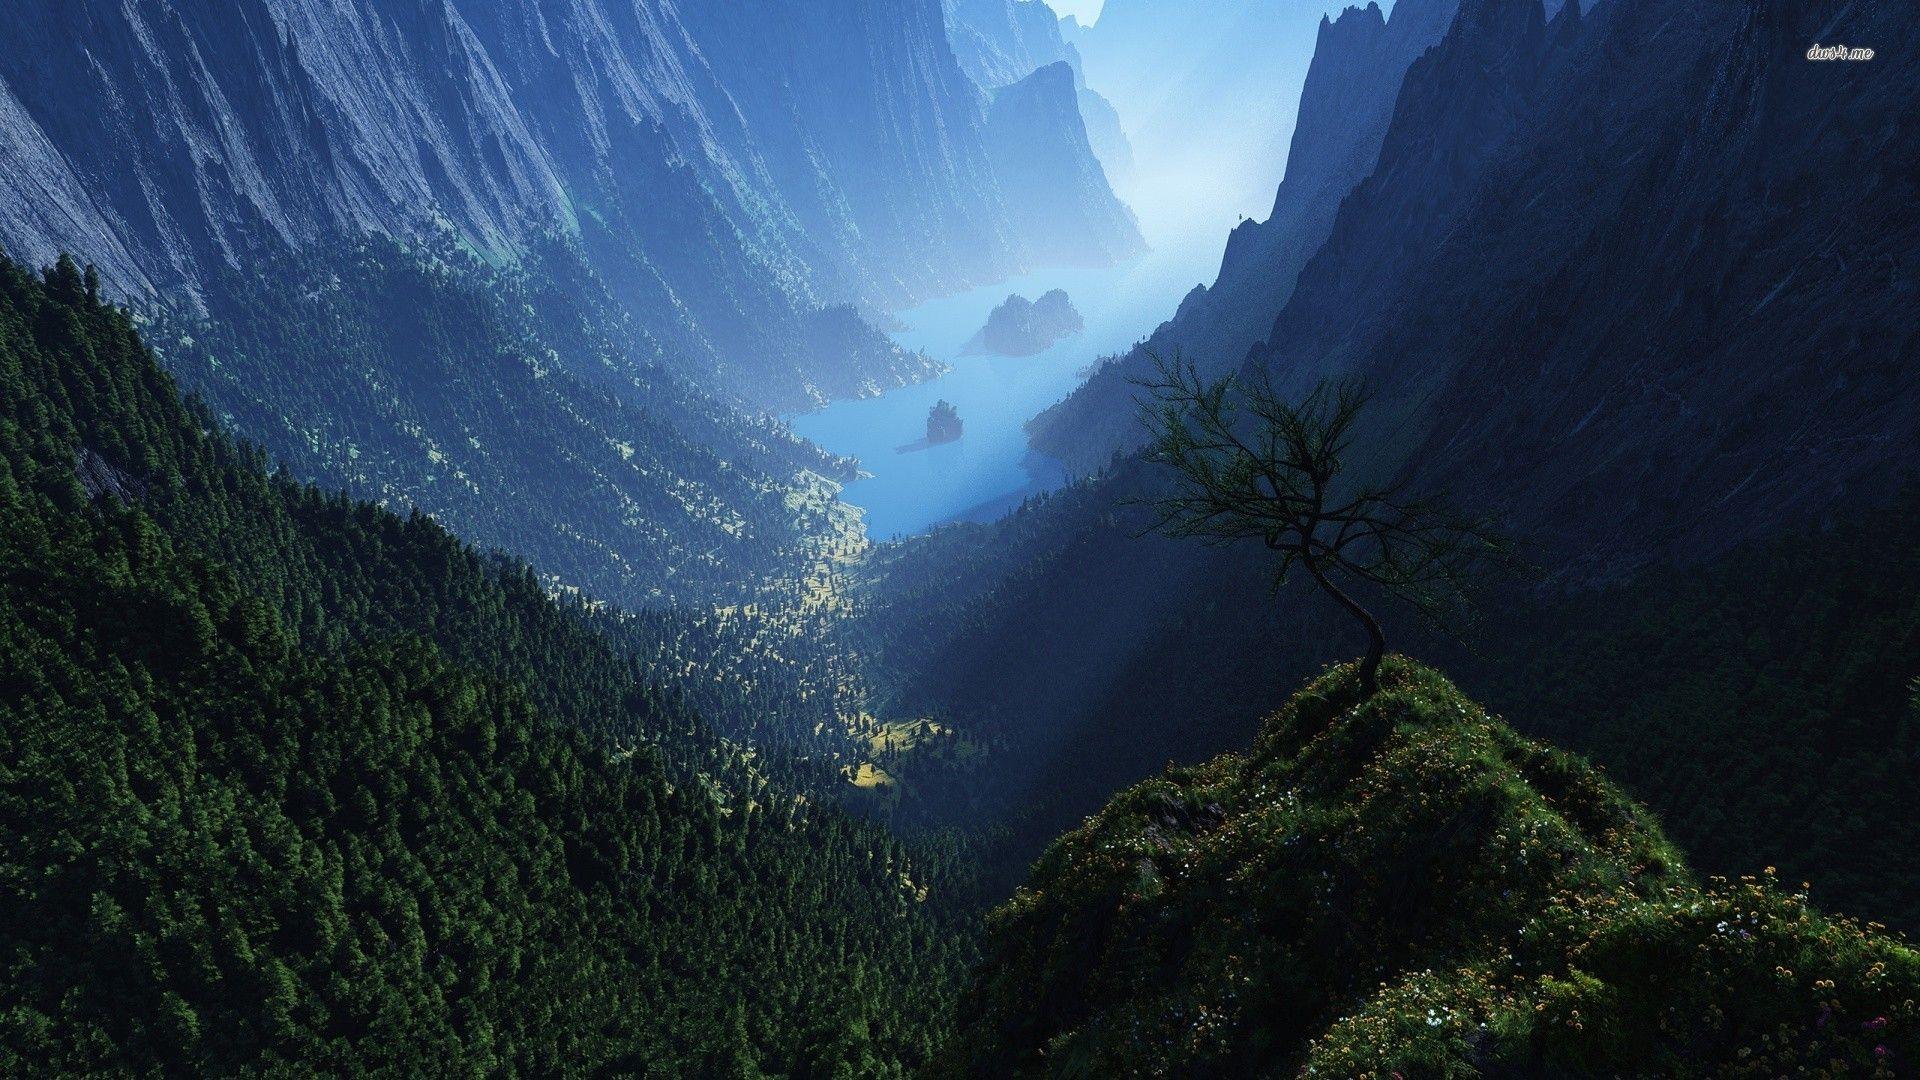 Simple Wallpaper Mountain Rain - 806e53f8d13a00cfba38947d60dbd545  Gallery_18248.jpg